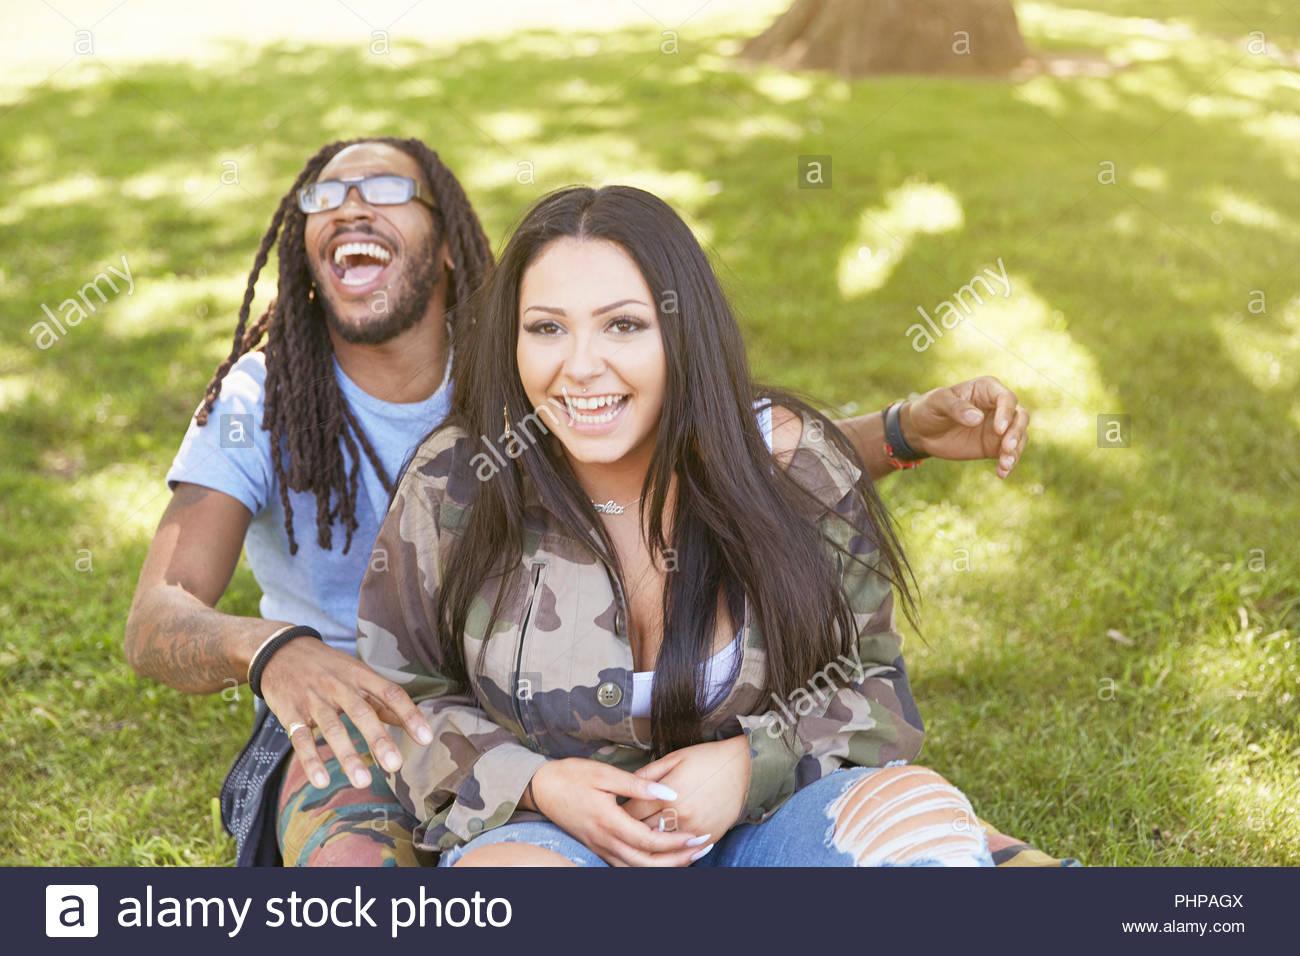 Couple at public park - Stock Image